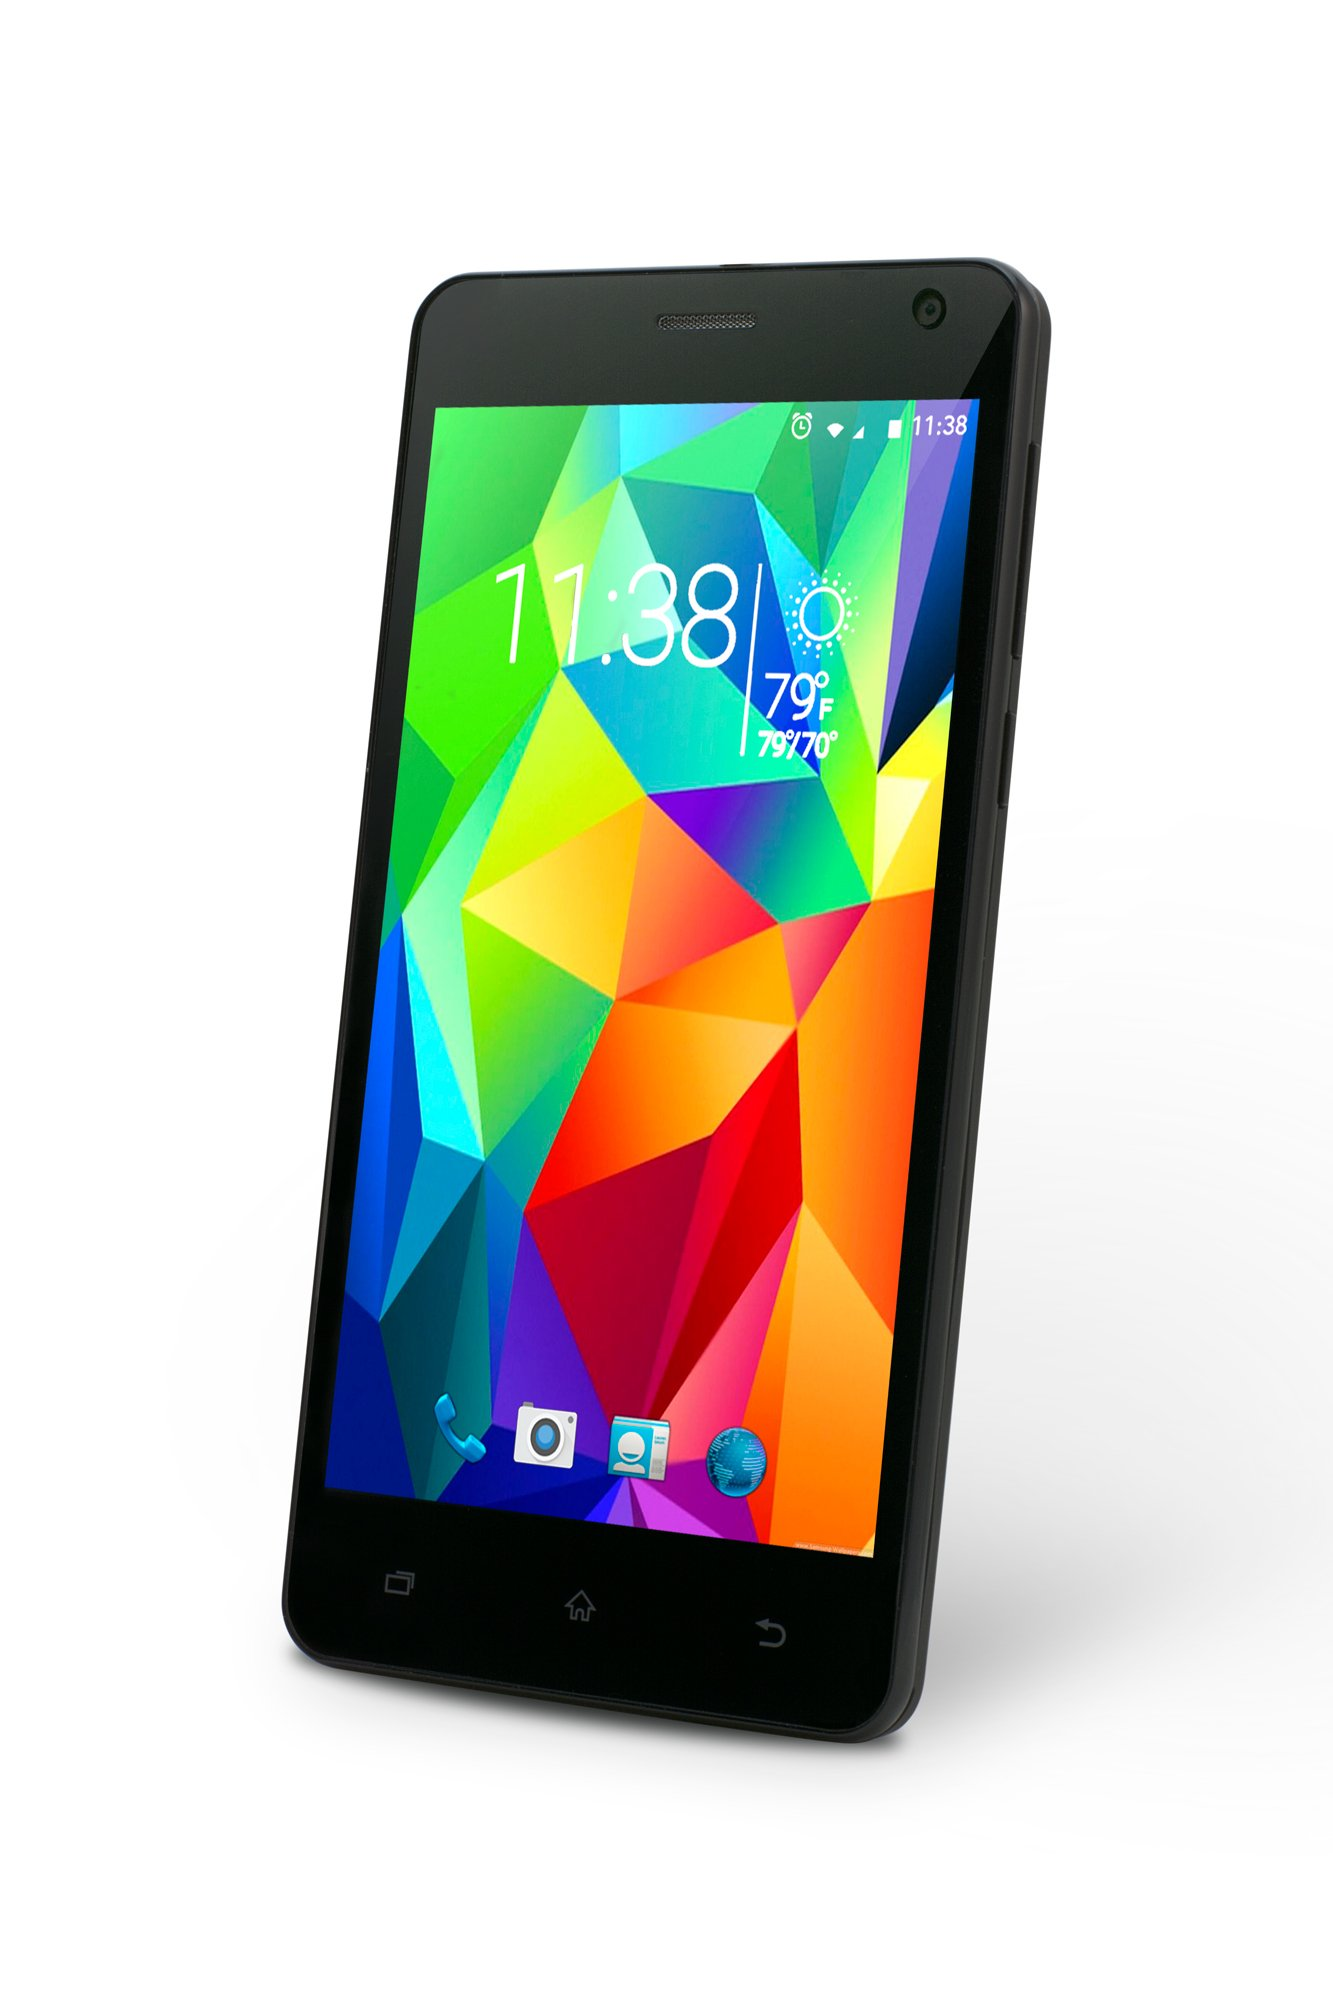 SLIDE Dual SIM 5'' Android 6.0 Unlocked Smartphone, Quad Core 1.3GHz Processor, 8GB Internal Storage, 1GB RAM, 8MP Camera, Nationwide 3G GSM Coverage- Black (SP5023)